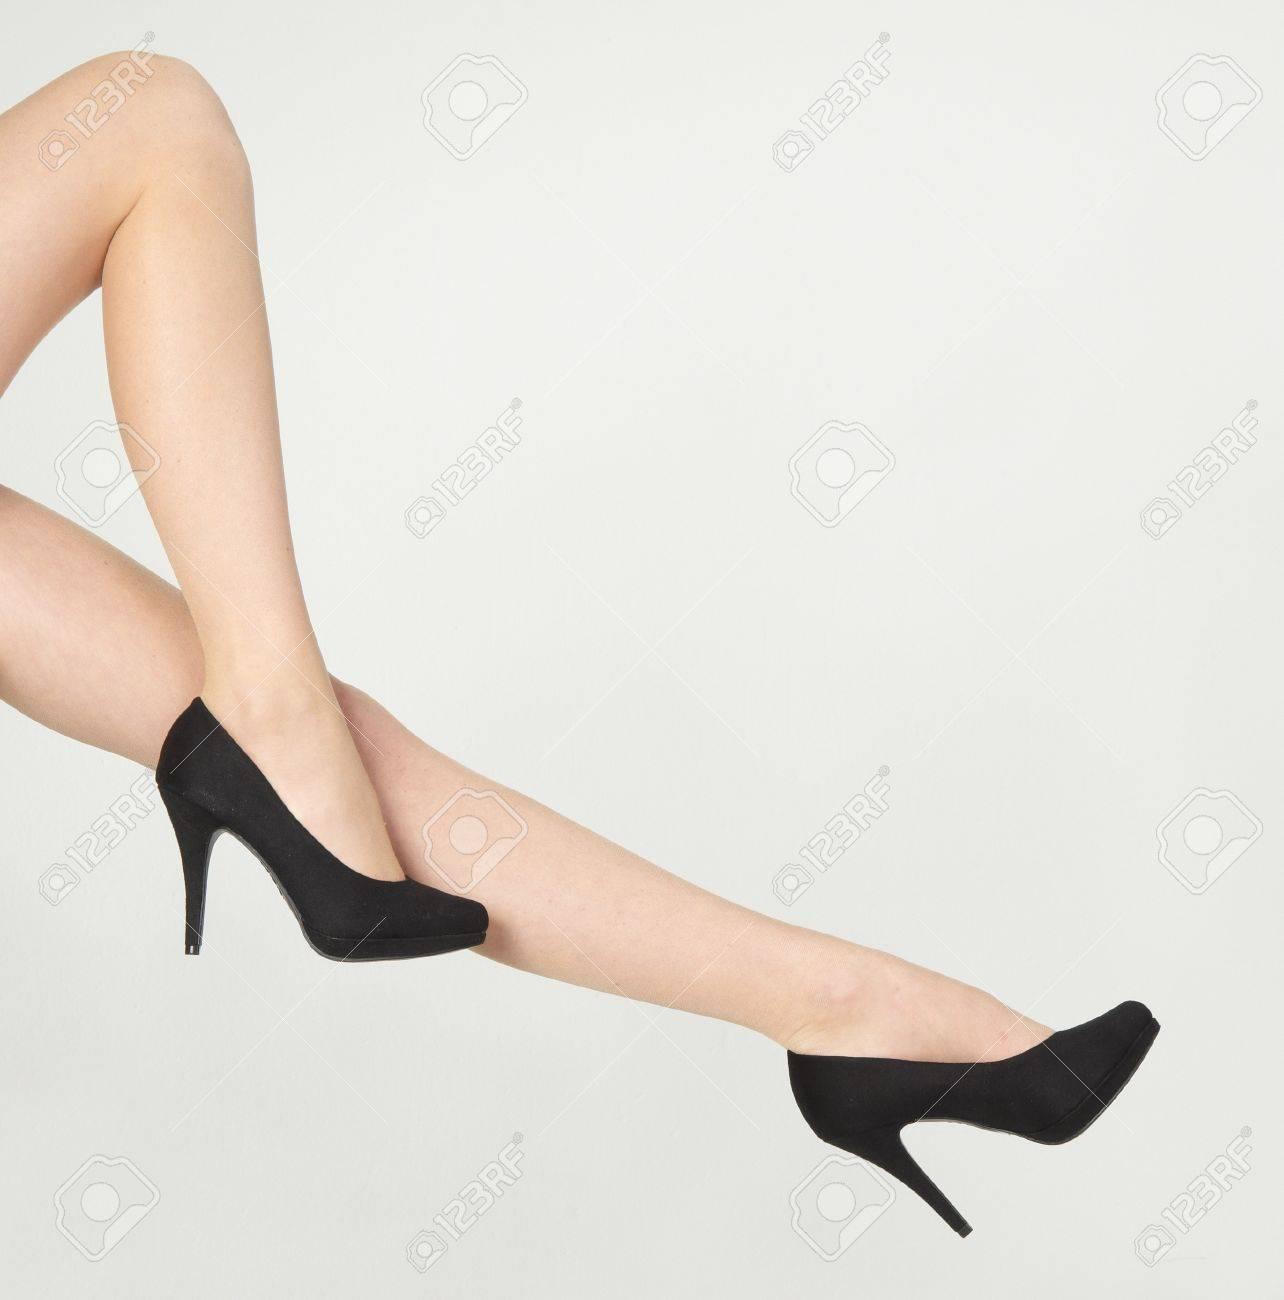 841305ae28e 여자의 팬티 스타킹을 입고 다리와 하이힐 로열티 무료 사진, 그림 ...